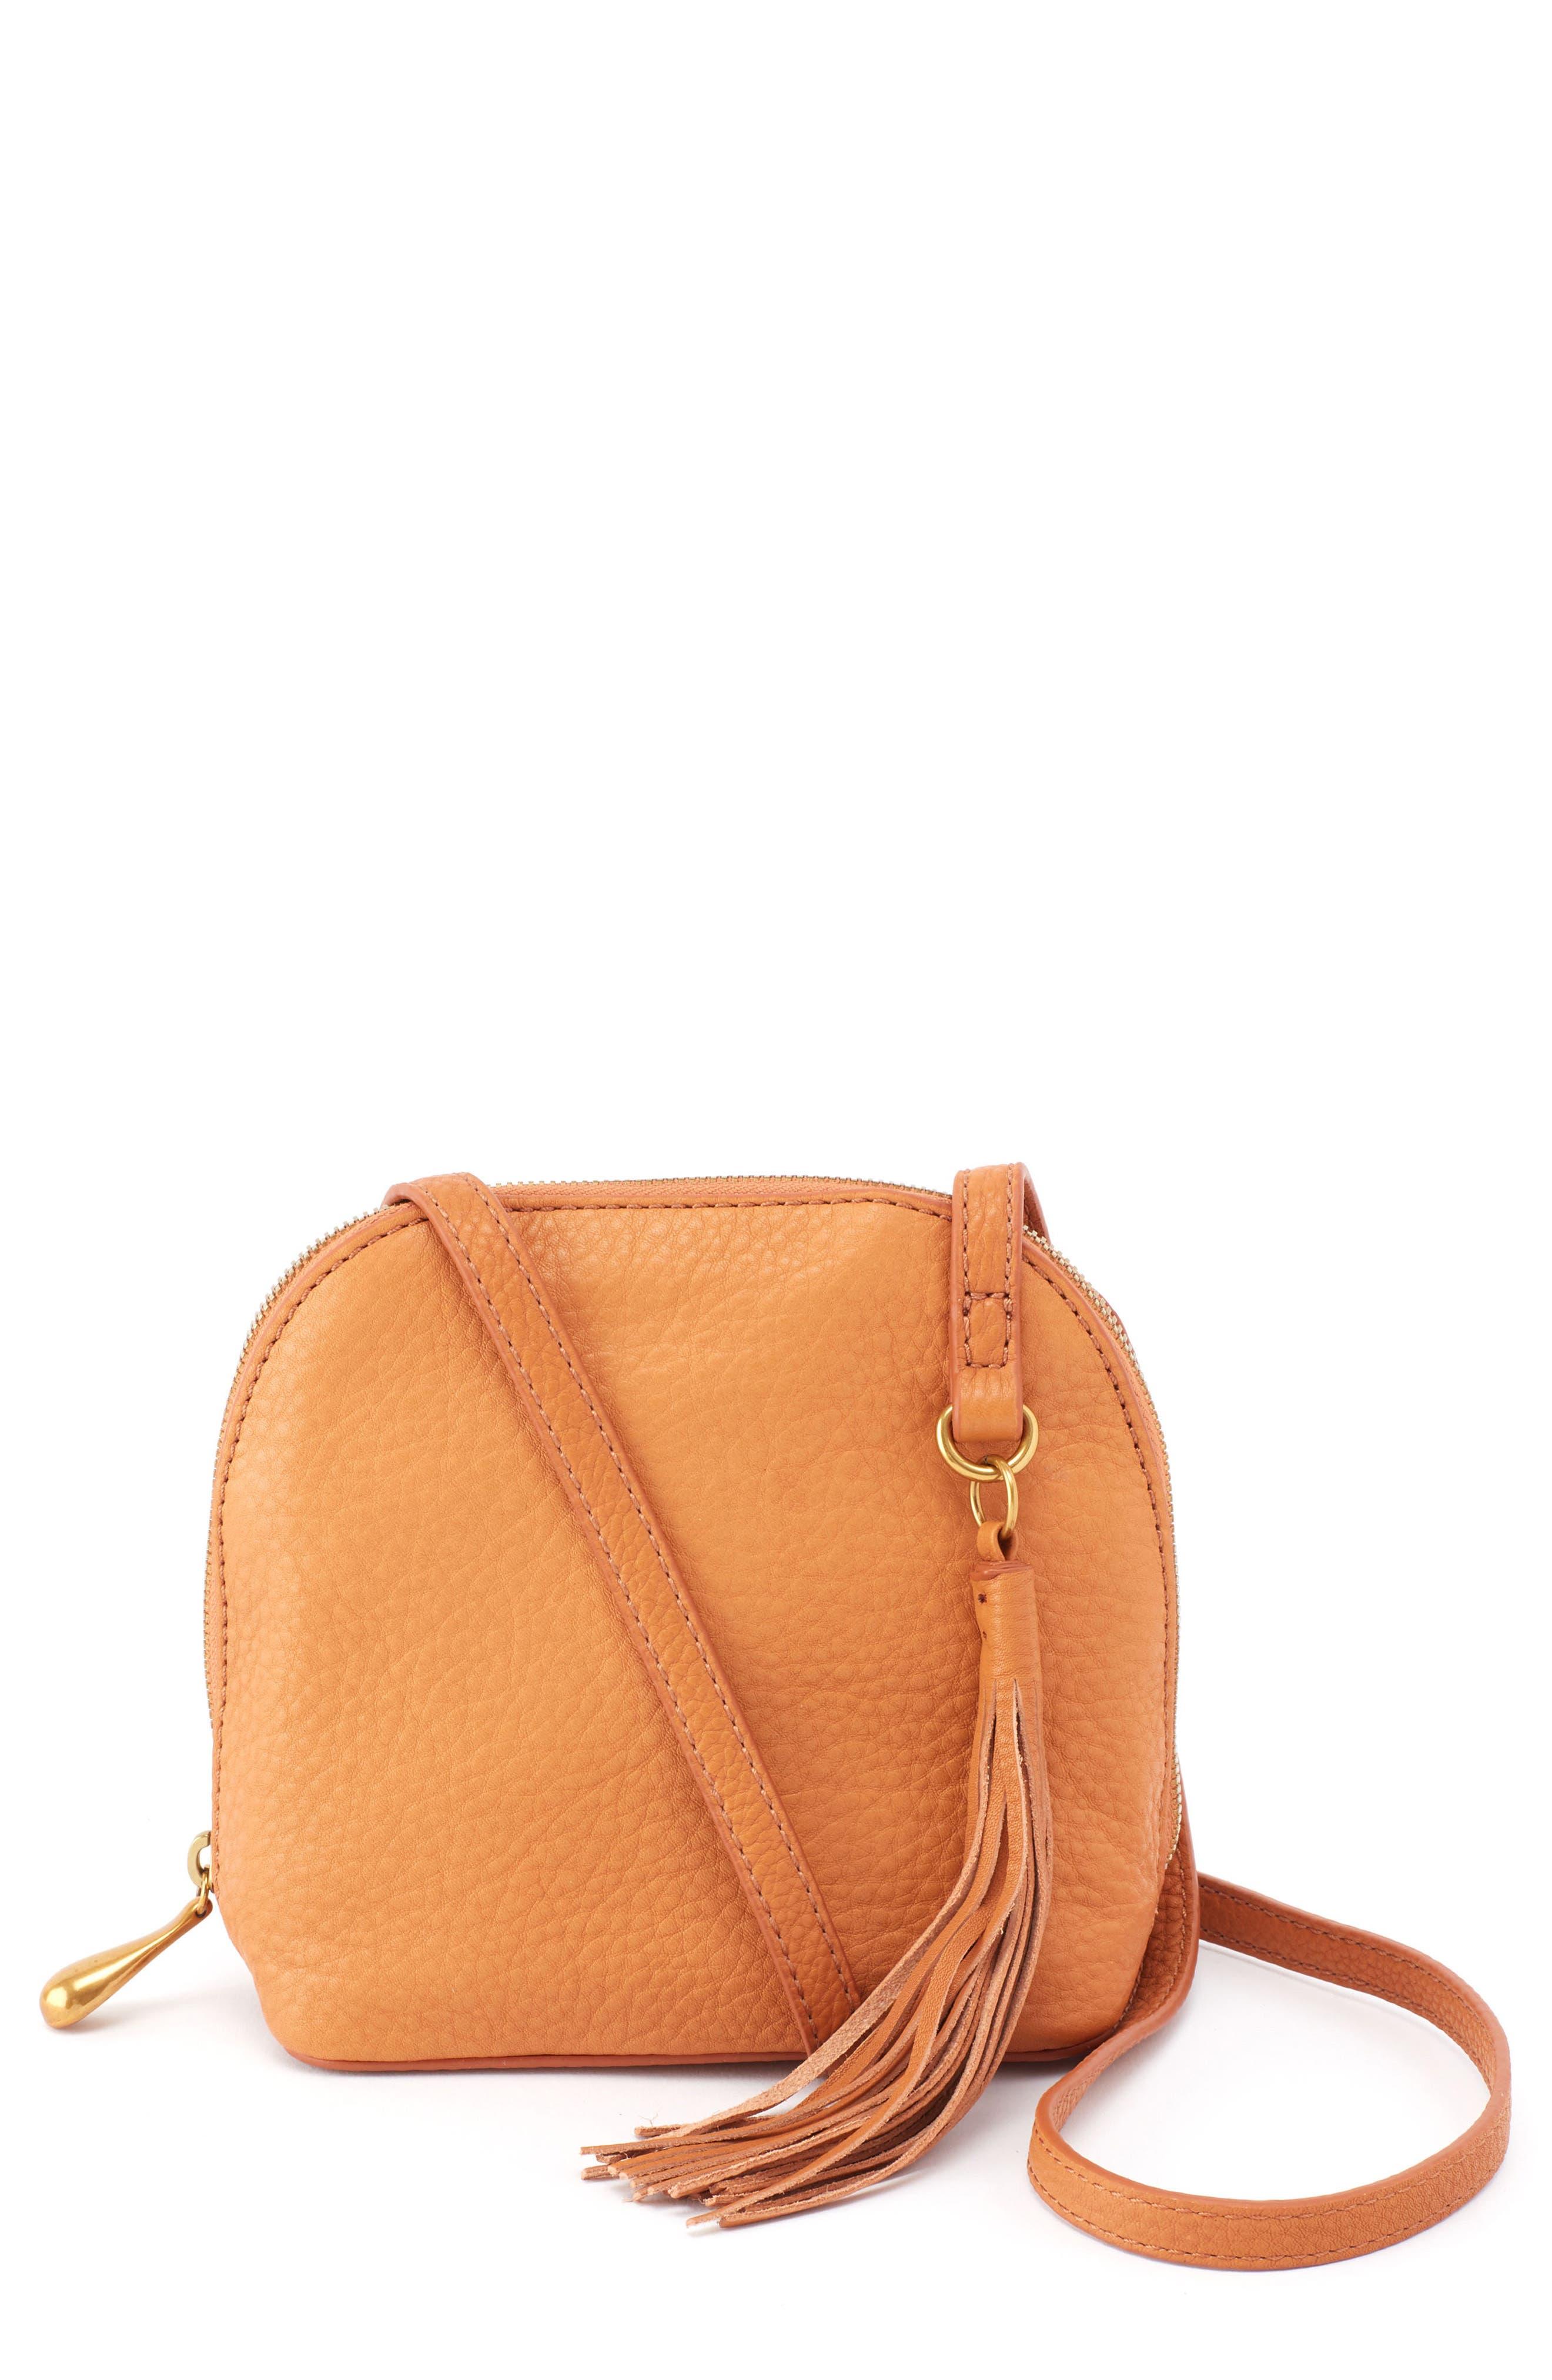 HOBO Nash Calfskin Leather Crossbody Bag, Main, color, WHISKEY